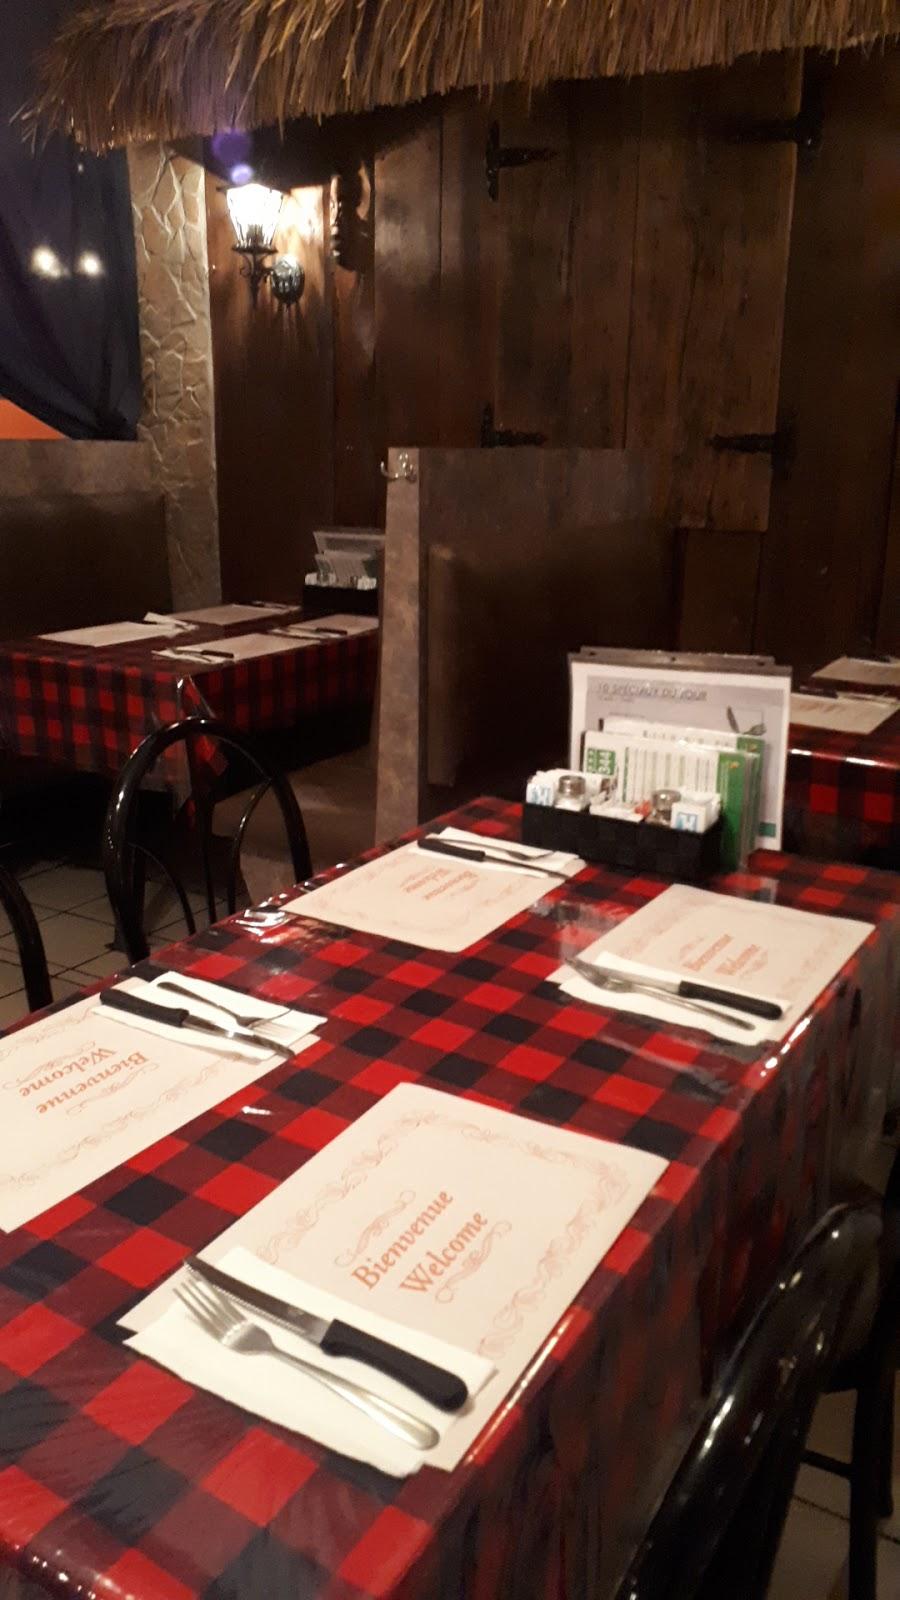 Pizza 344 | restaurant | 84 Rue de lÉglise, Saint-Placide, QC J0V 2B0, Canada | 4504123341 OR +1 450-412-3341